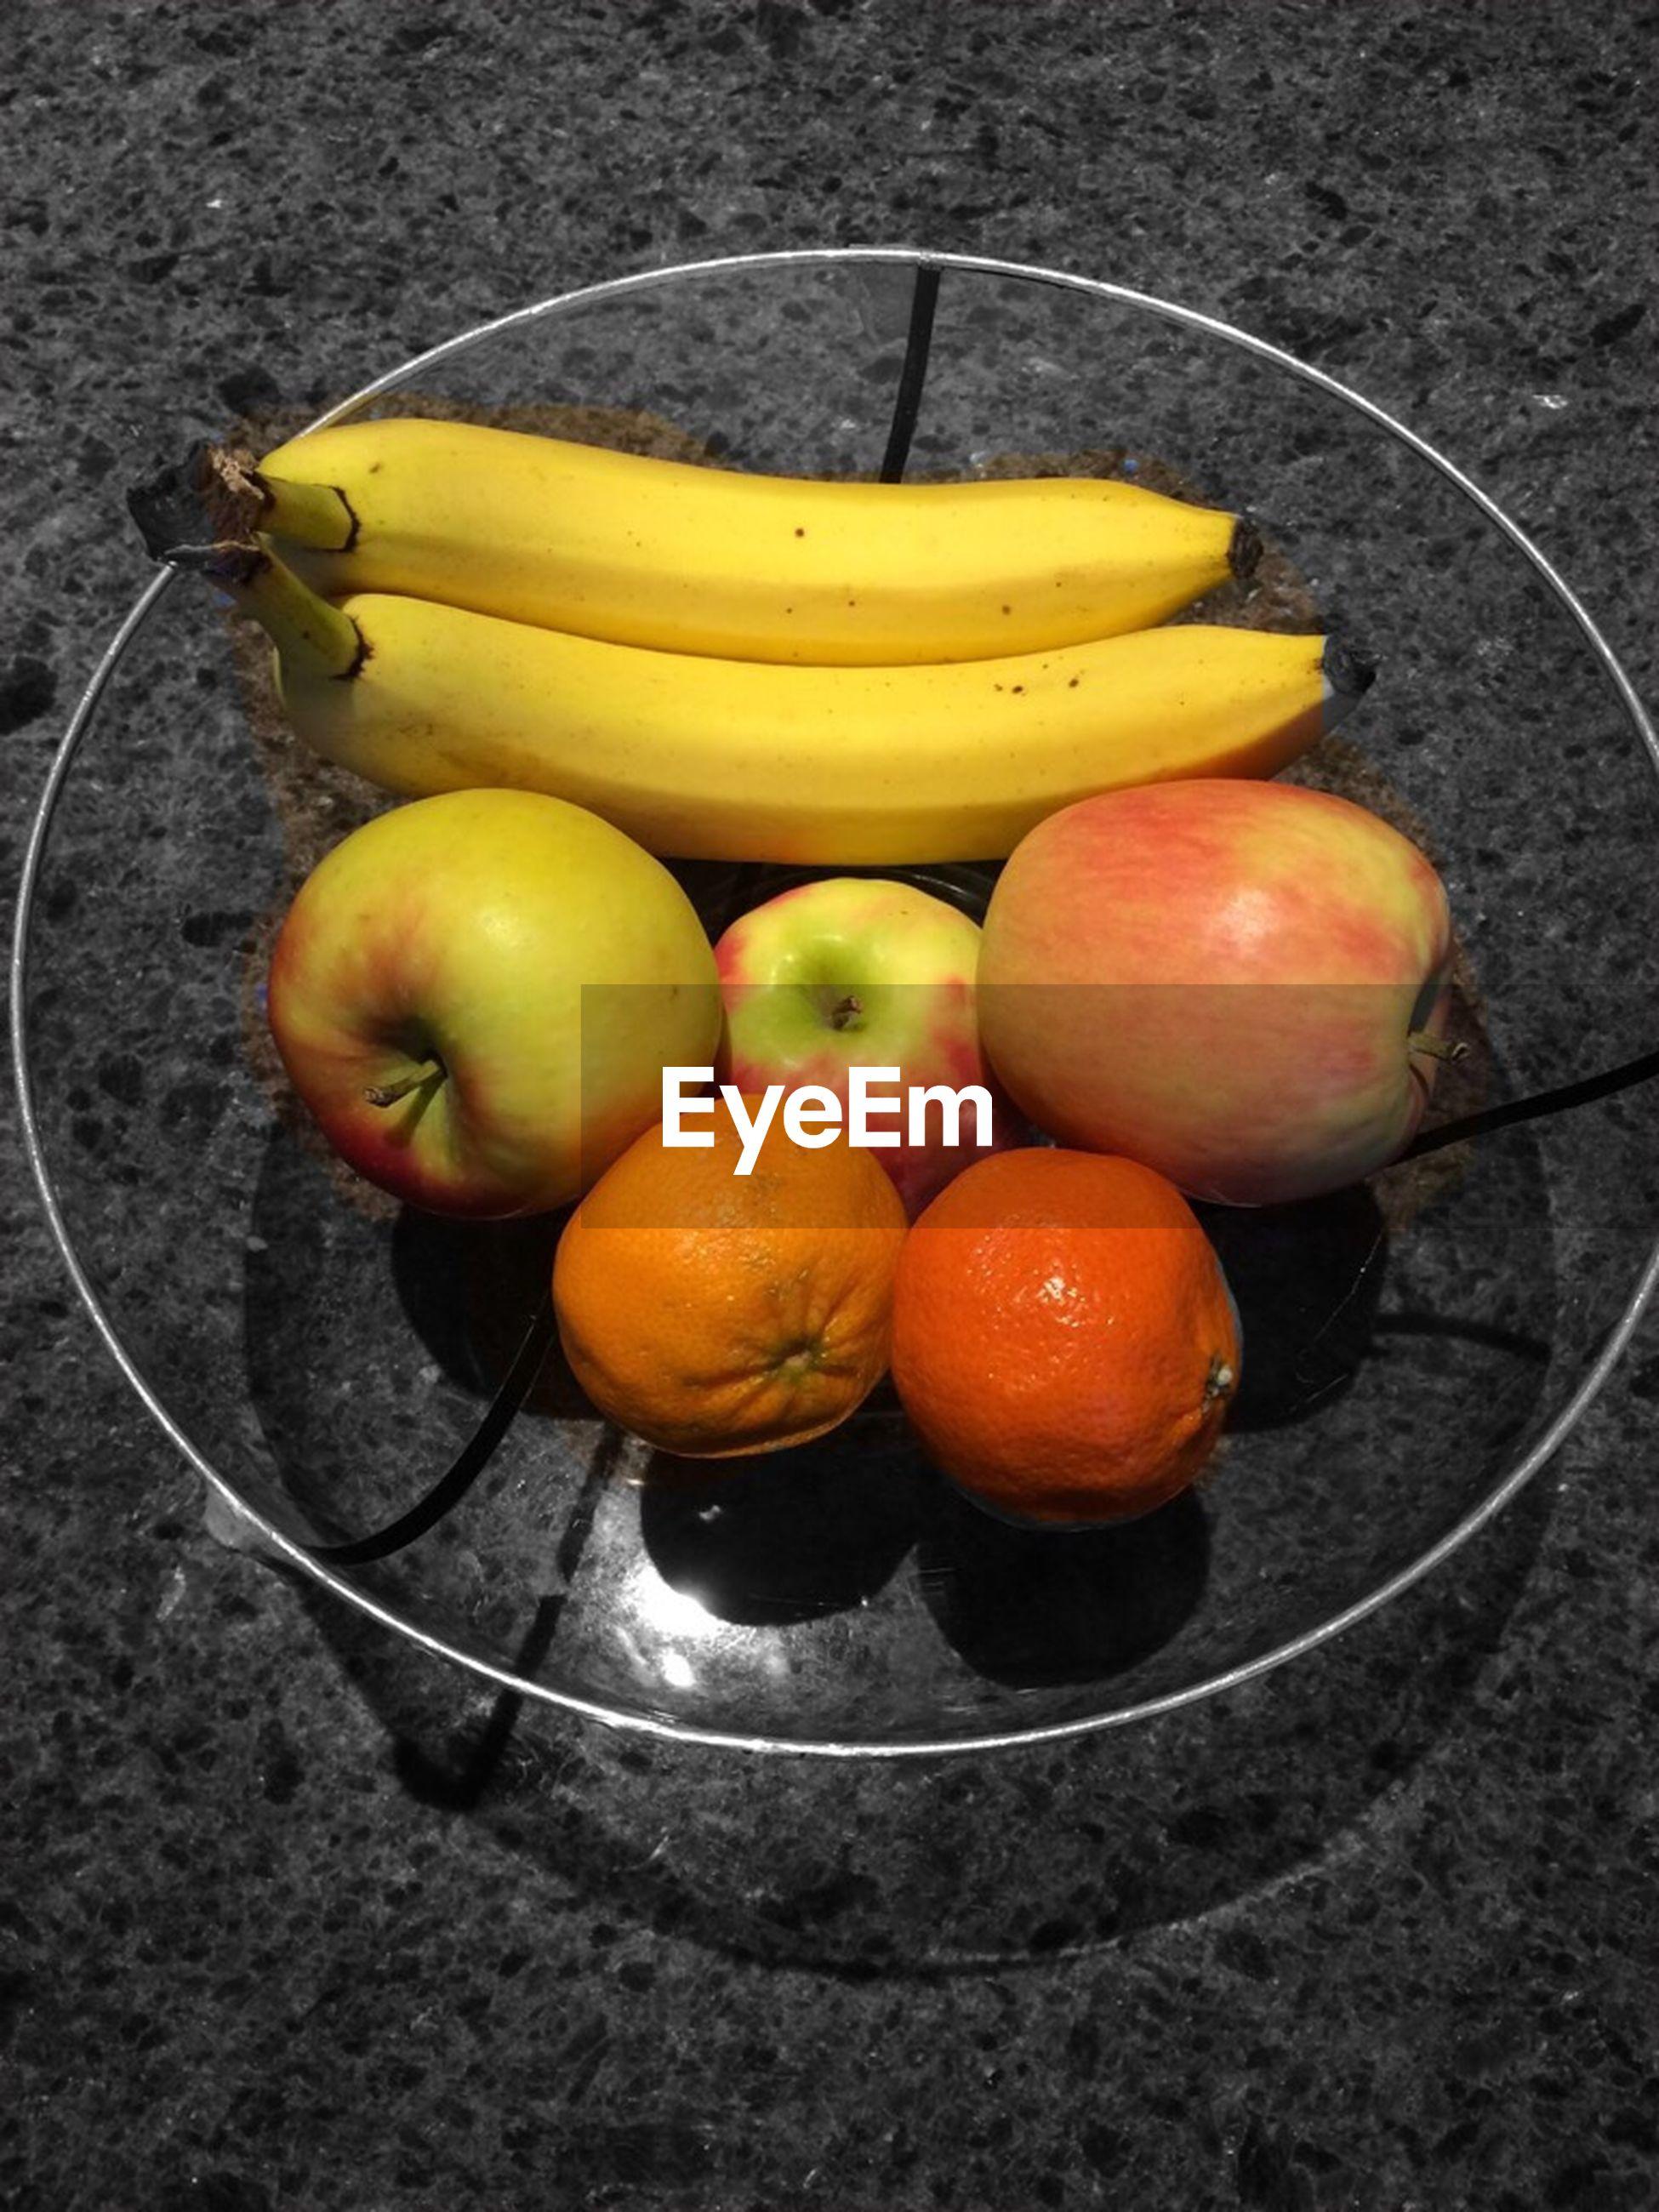 food and drink, food, fruit, healthy eating, freshness, still life, high angle view, table, indoors, bowl, yellow, orange - fruit, basket, vegetable, ripe, organic, close-up, no people, lemon, banana